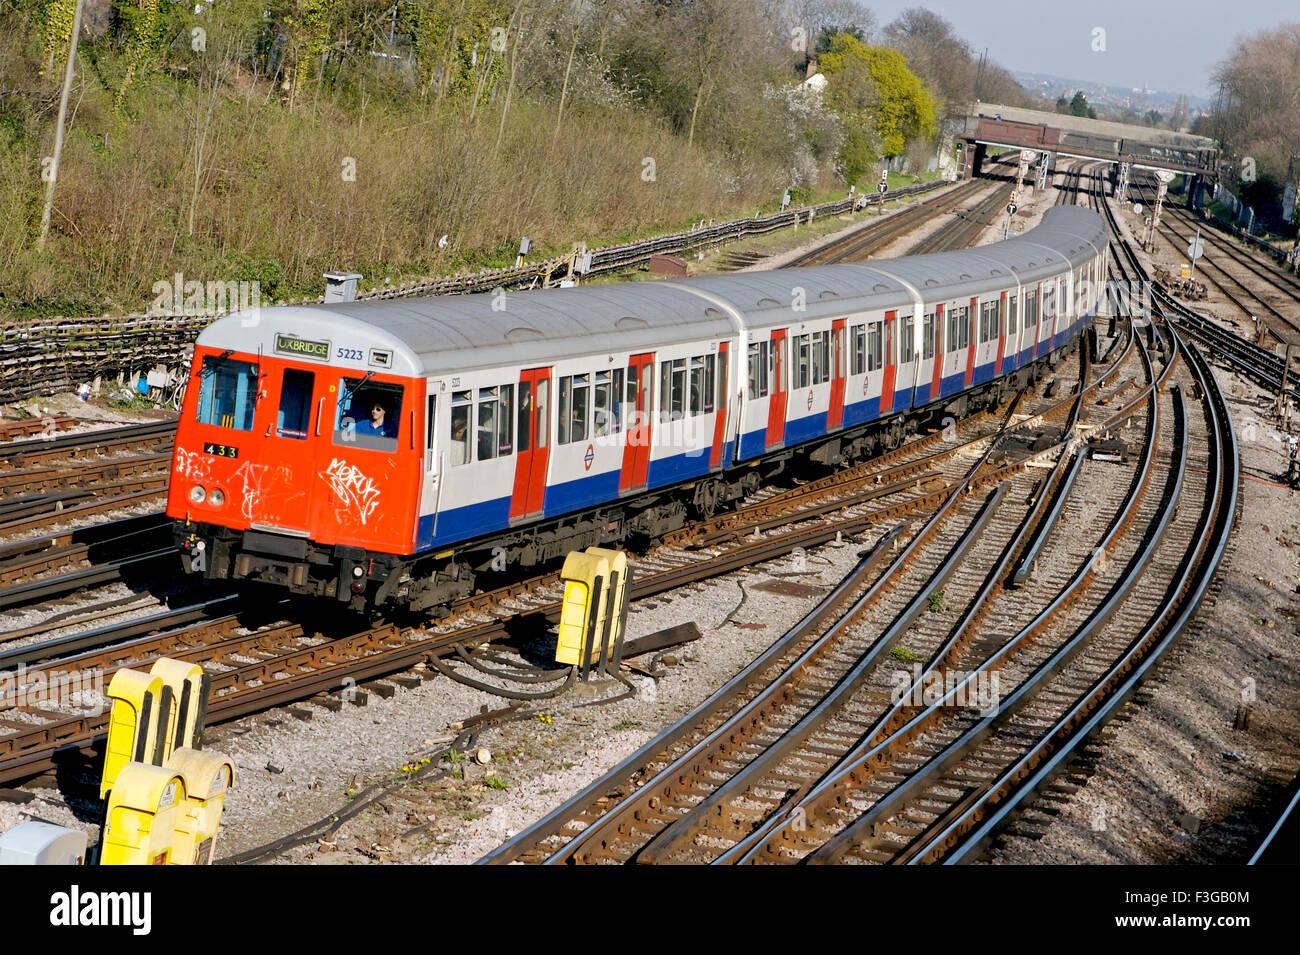 Tube train on tracks ; London ; U.K. United Kingdom England - Stock Image